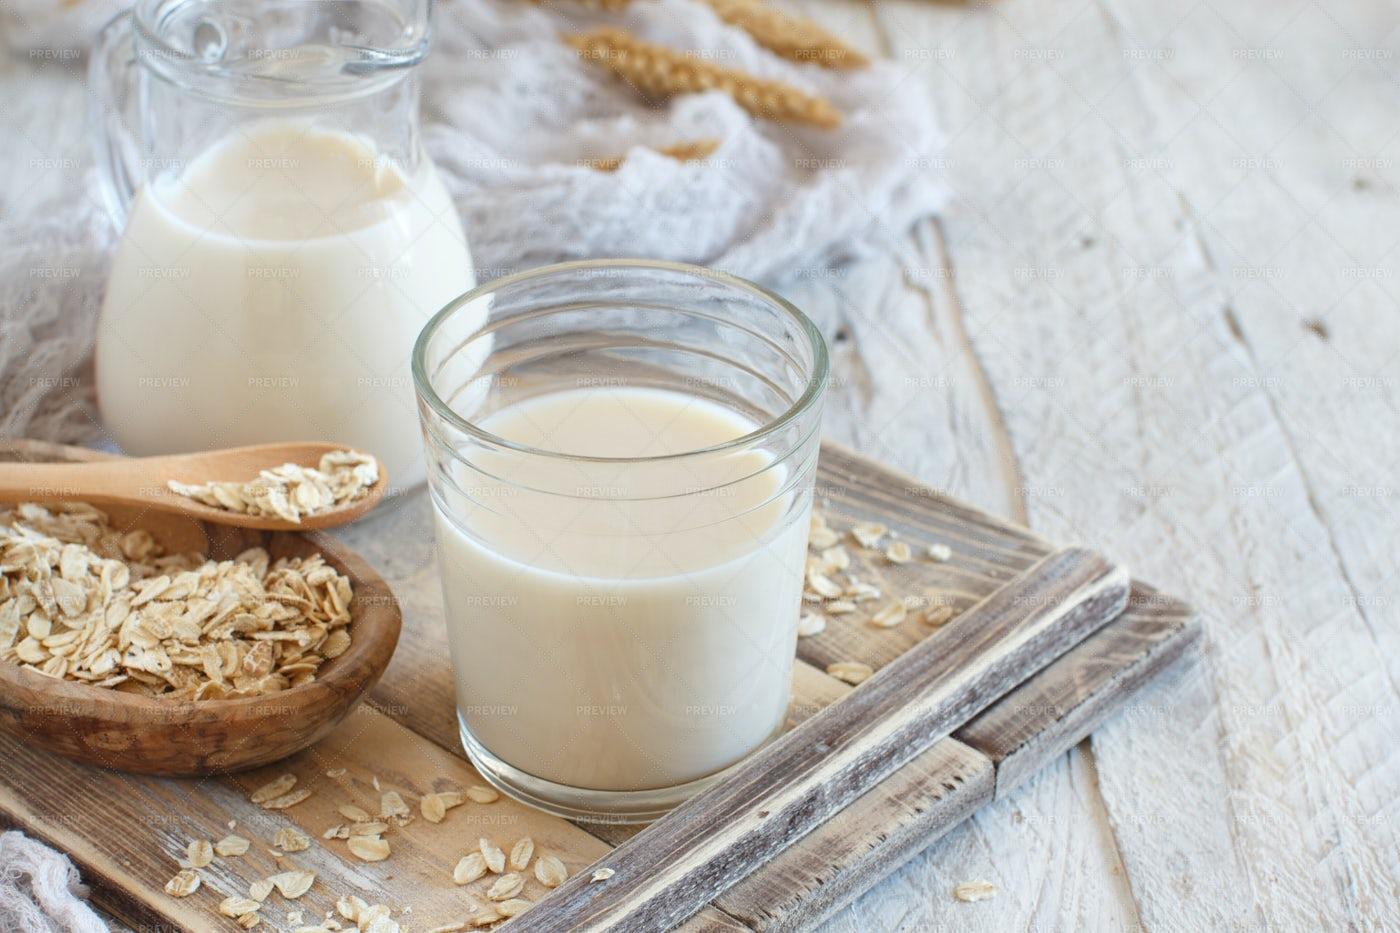 Glass Of Oat Milk: Stock Photos